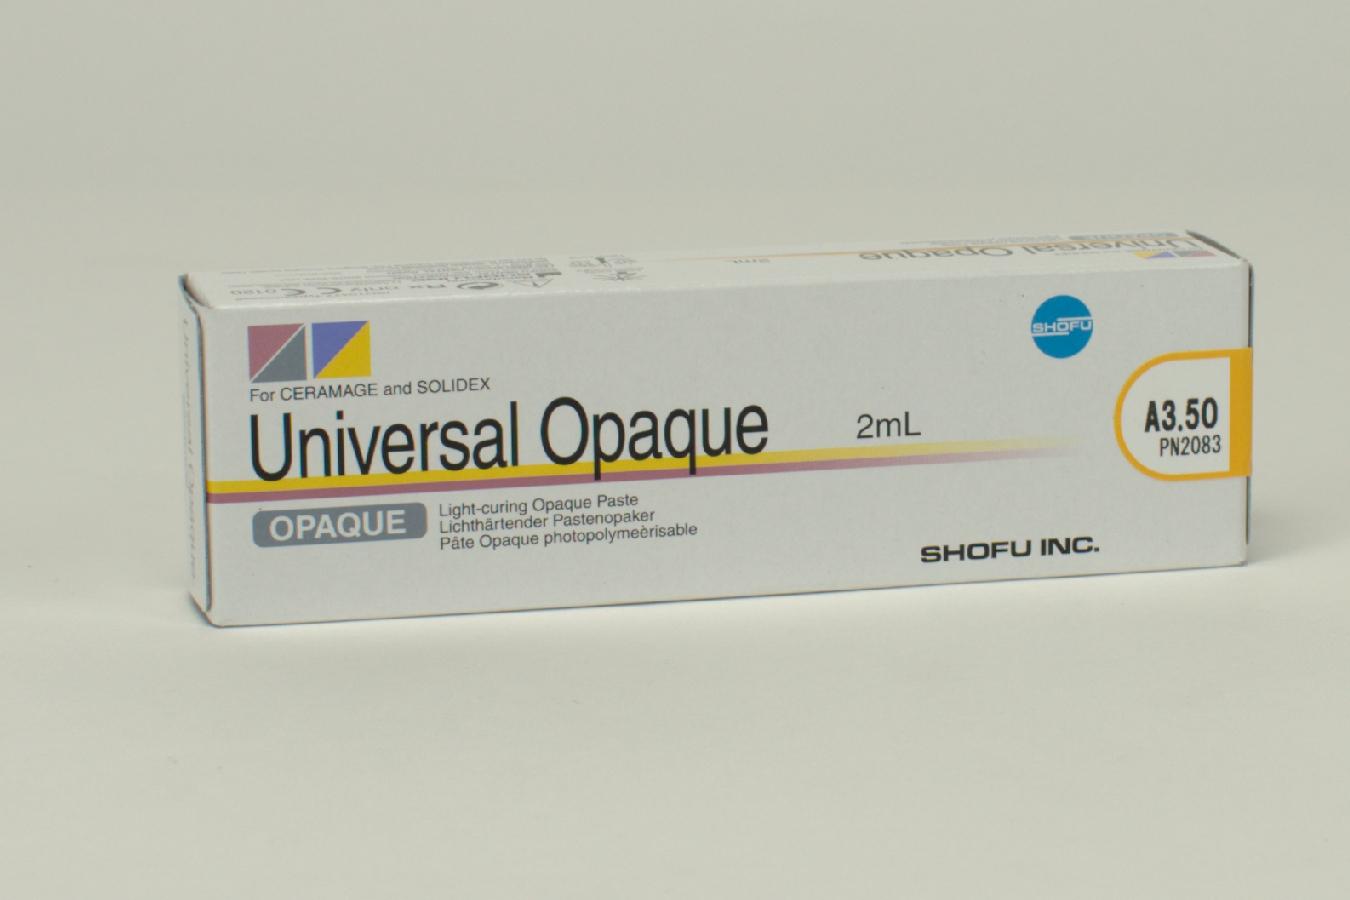 Universal Opaque A3,50 2ml Spr